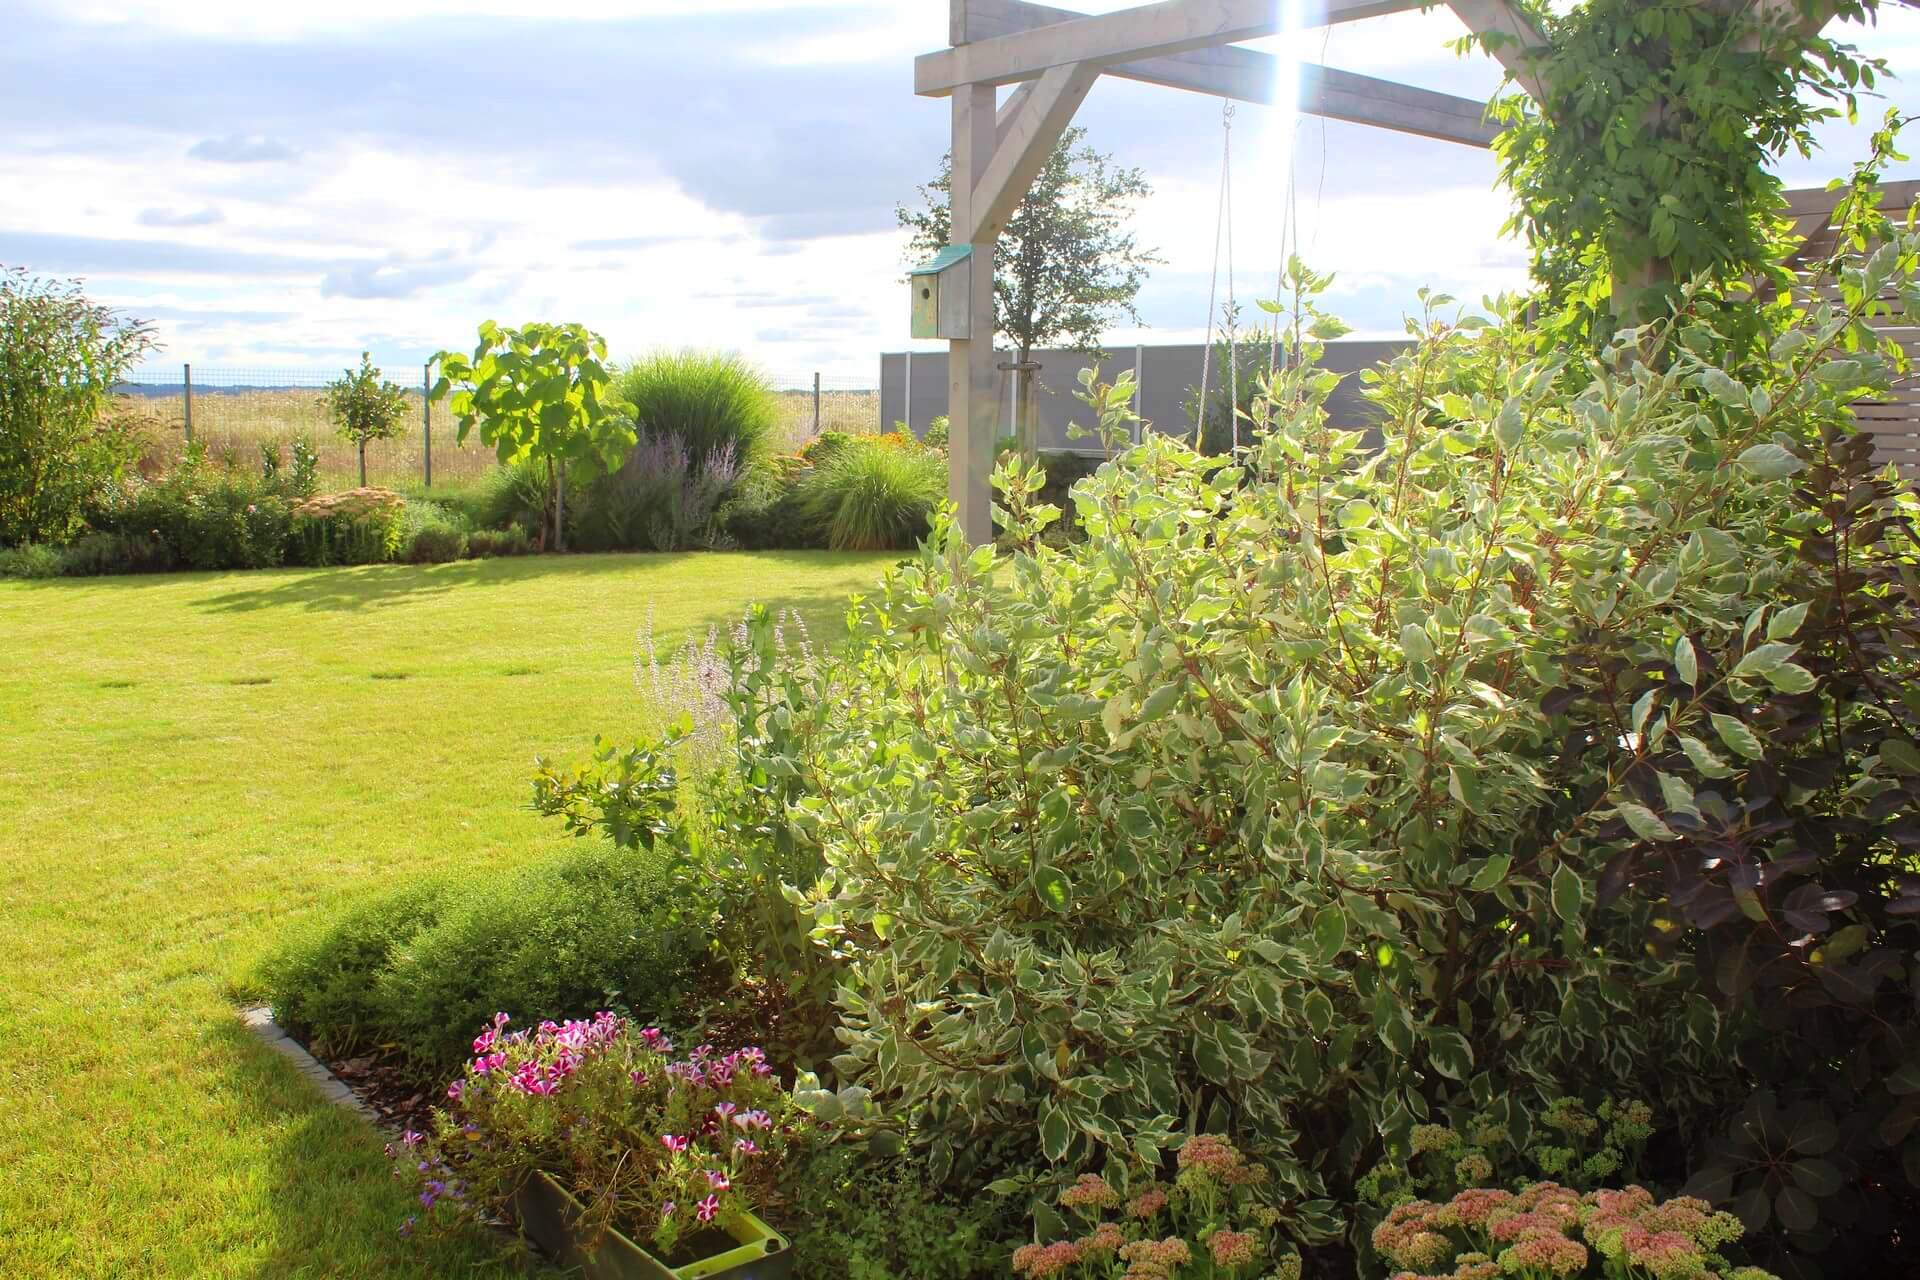 zahradni-stesti-realizace-SM-jana-frycova